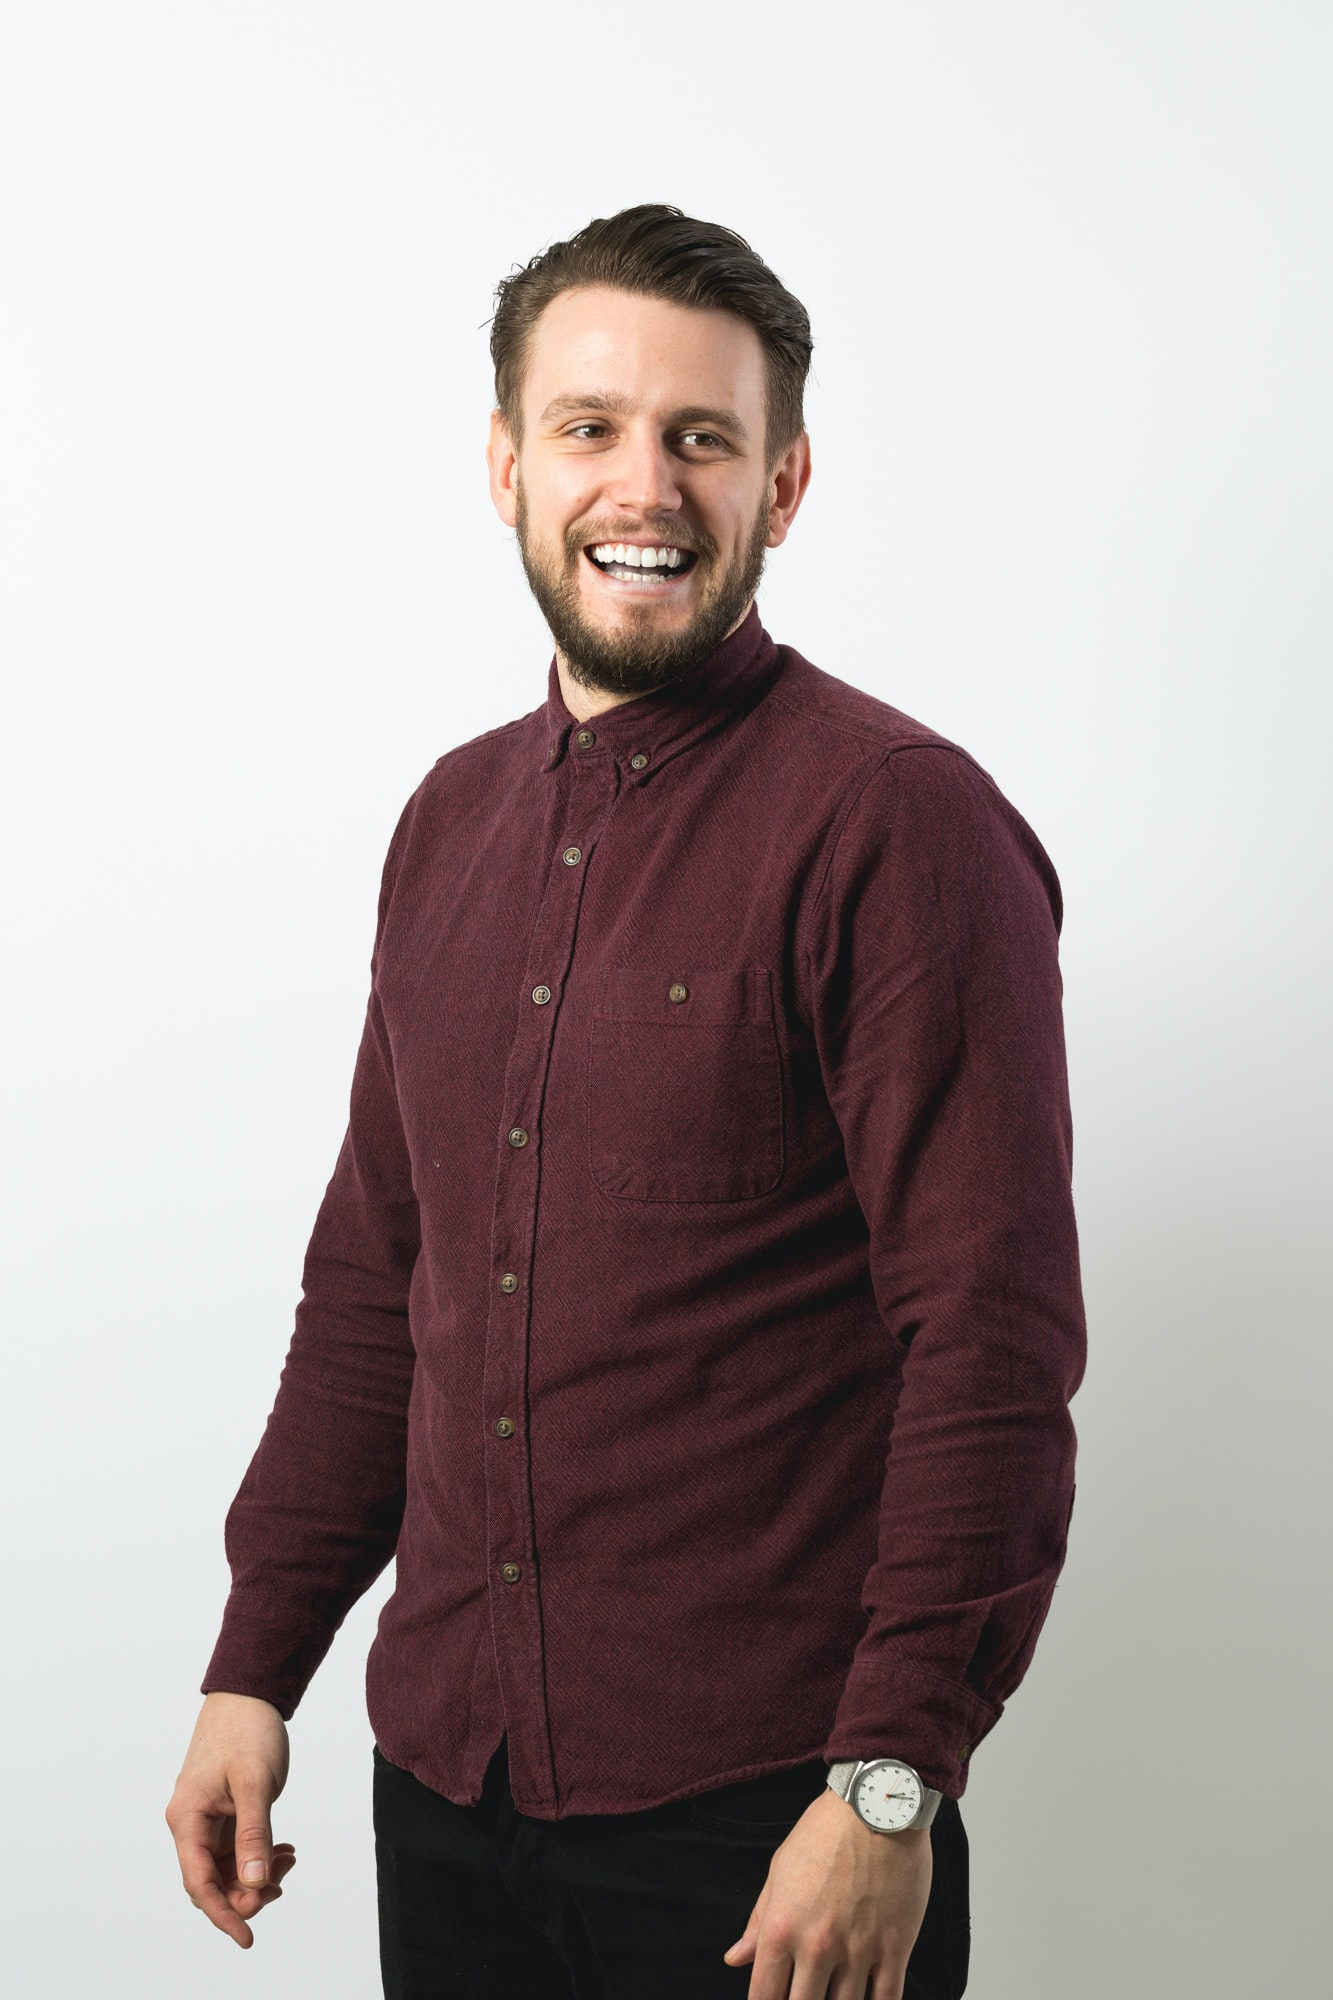 Go to Luke Matthews's profile